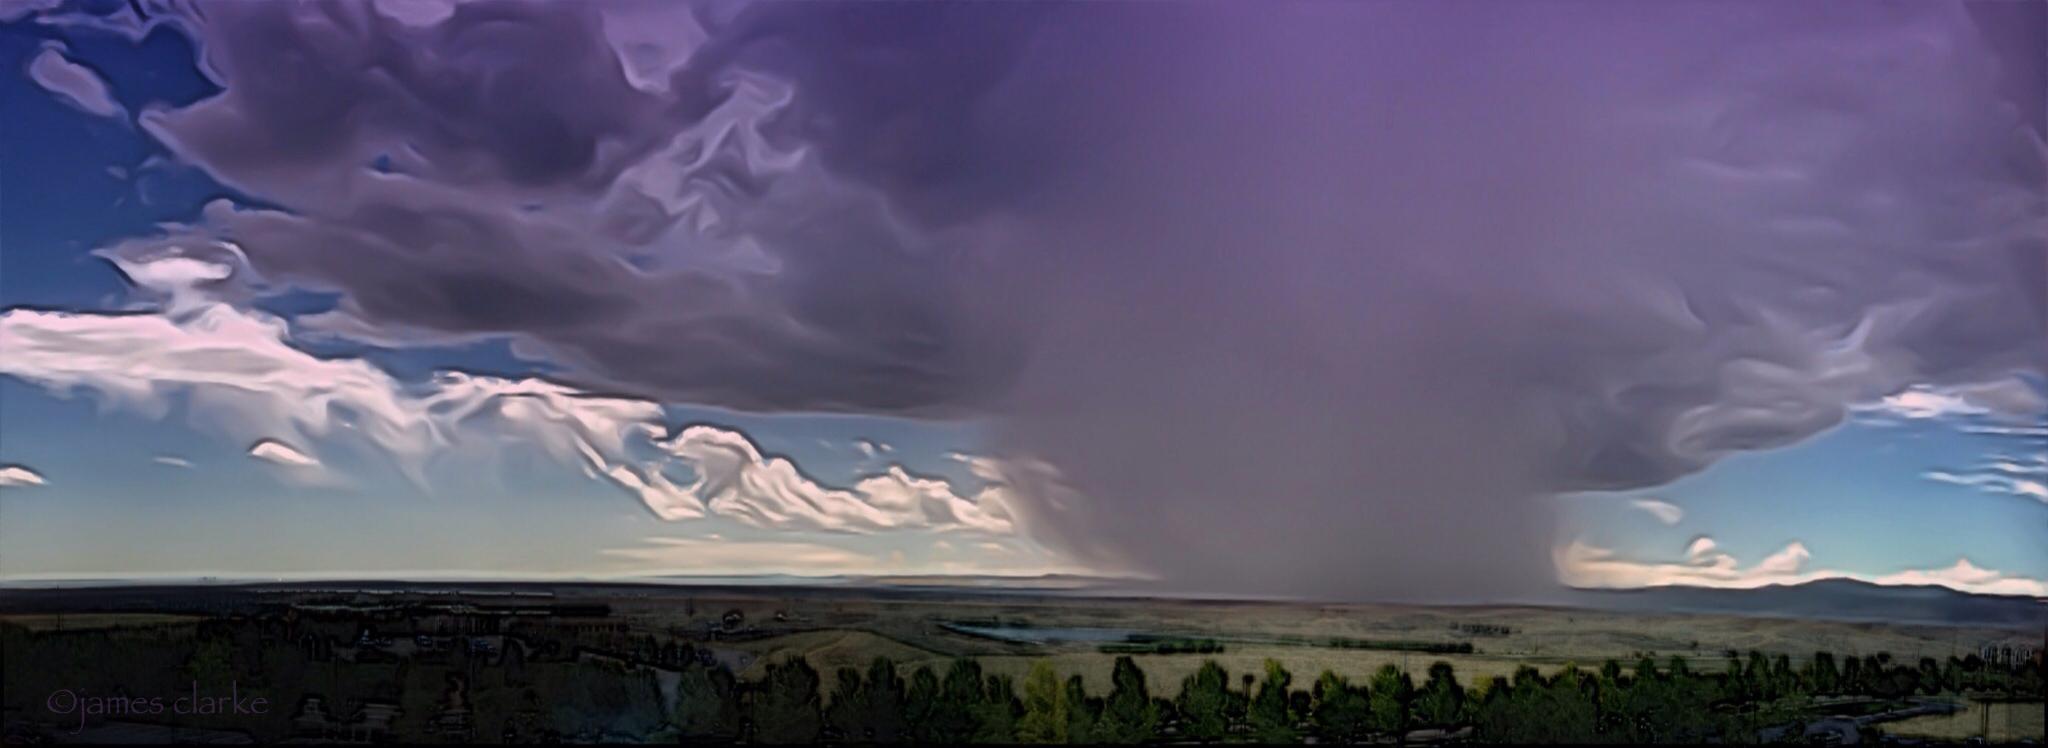 James Clarke ~ Clouds #159